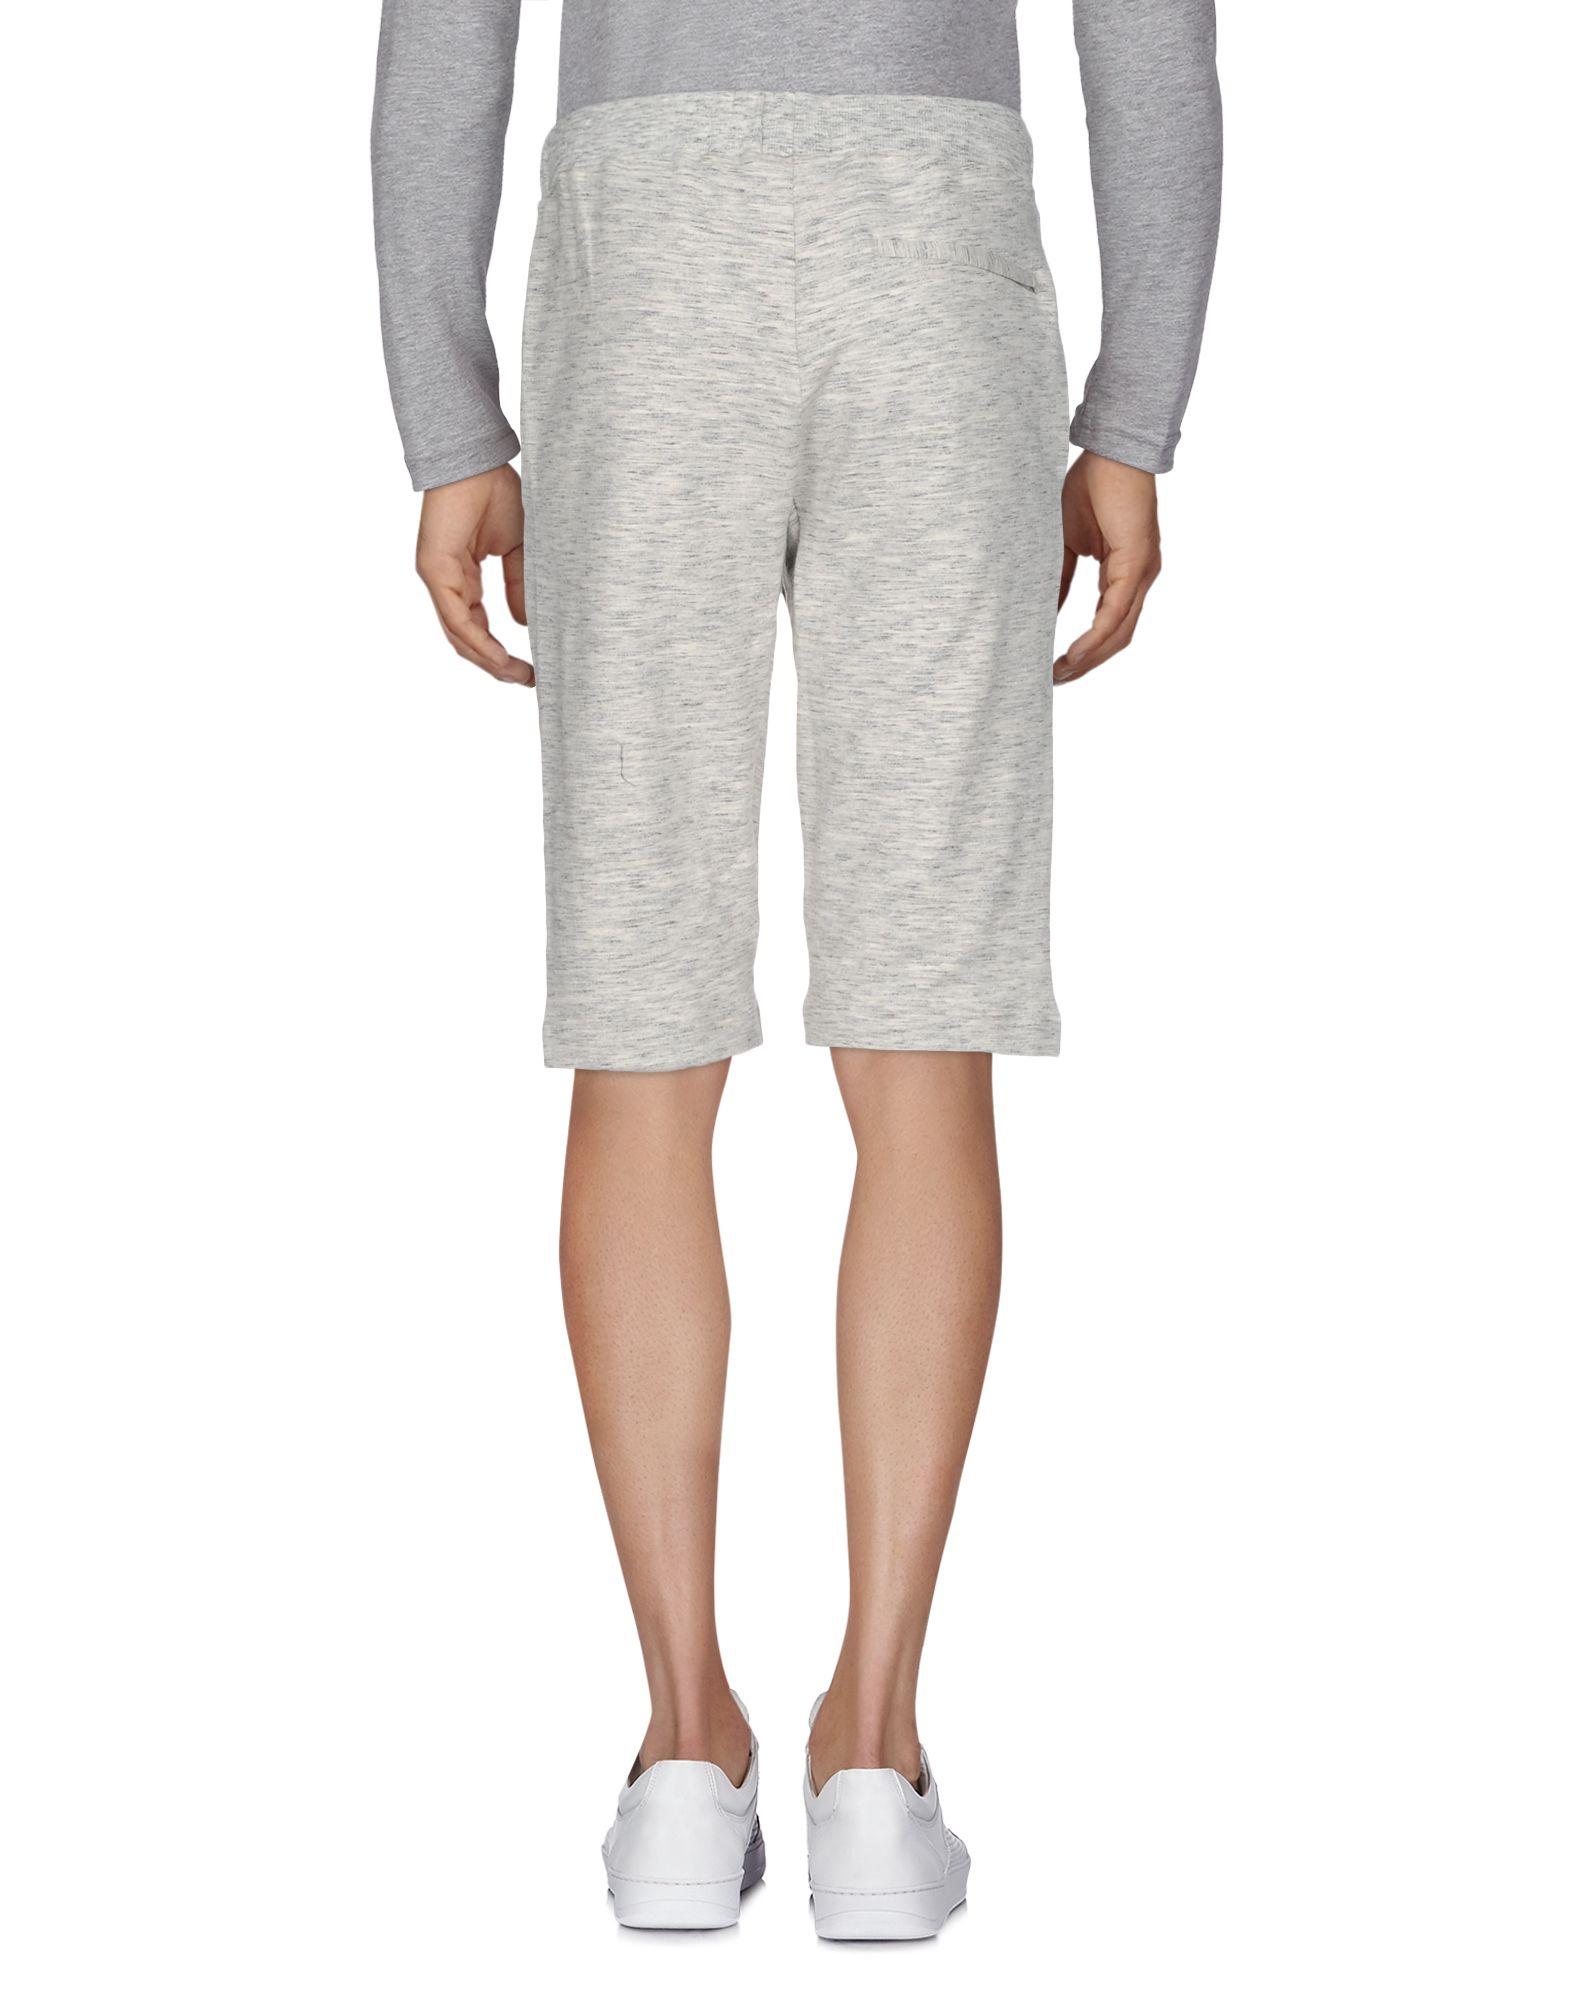 Pantalone Felpa Theory Uomo - 13170883GM 13170883GM - 8c53e4